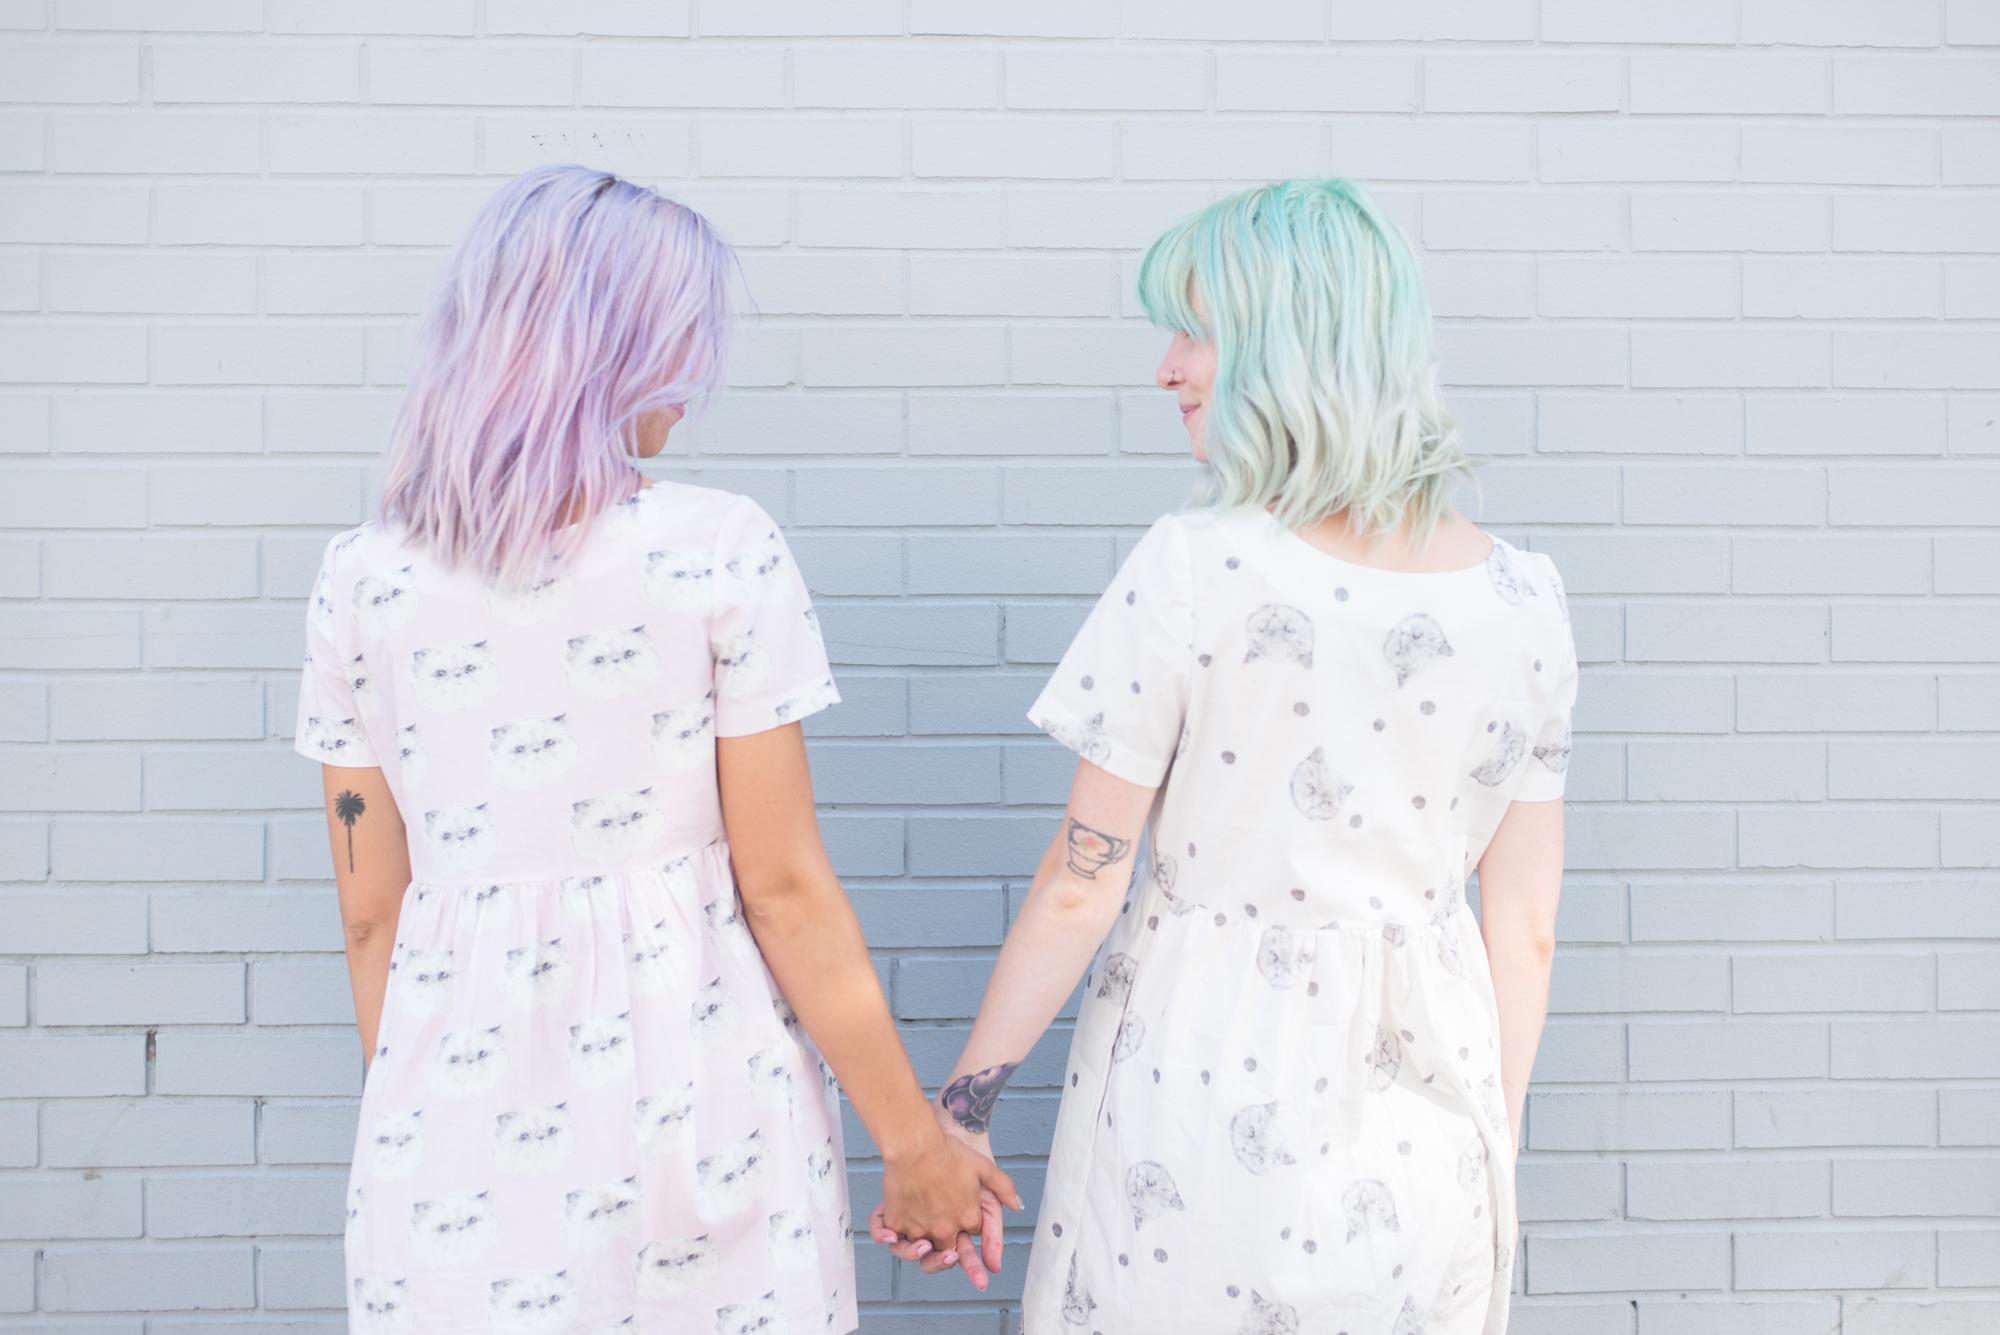 RAOP-twins-602817